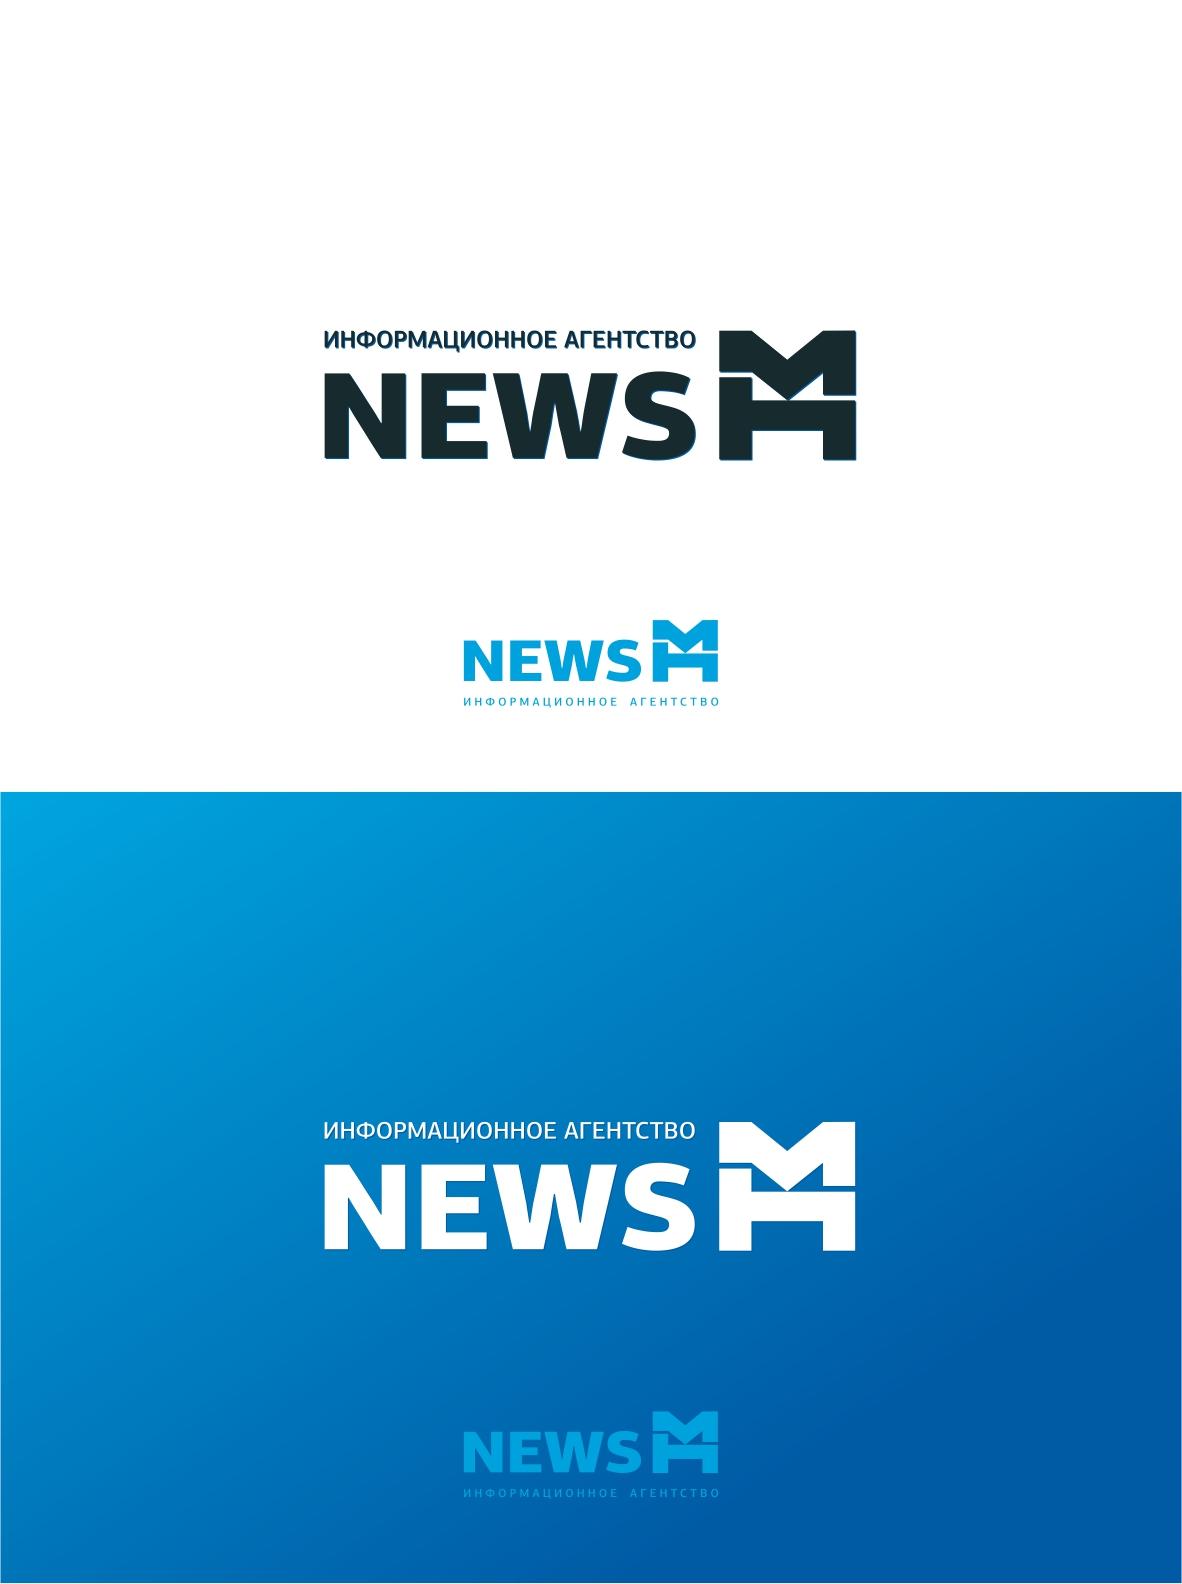 Логотип для информационного агентства фото f_6115aa3c1ff5f69a.jpg